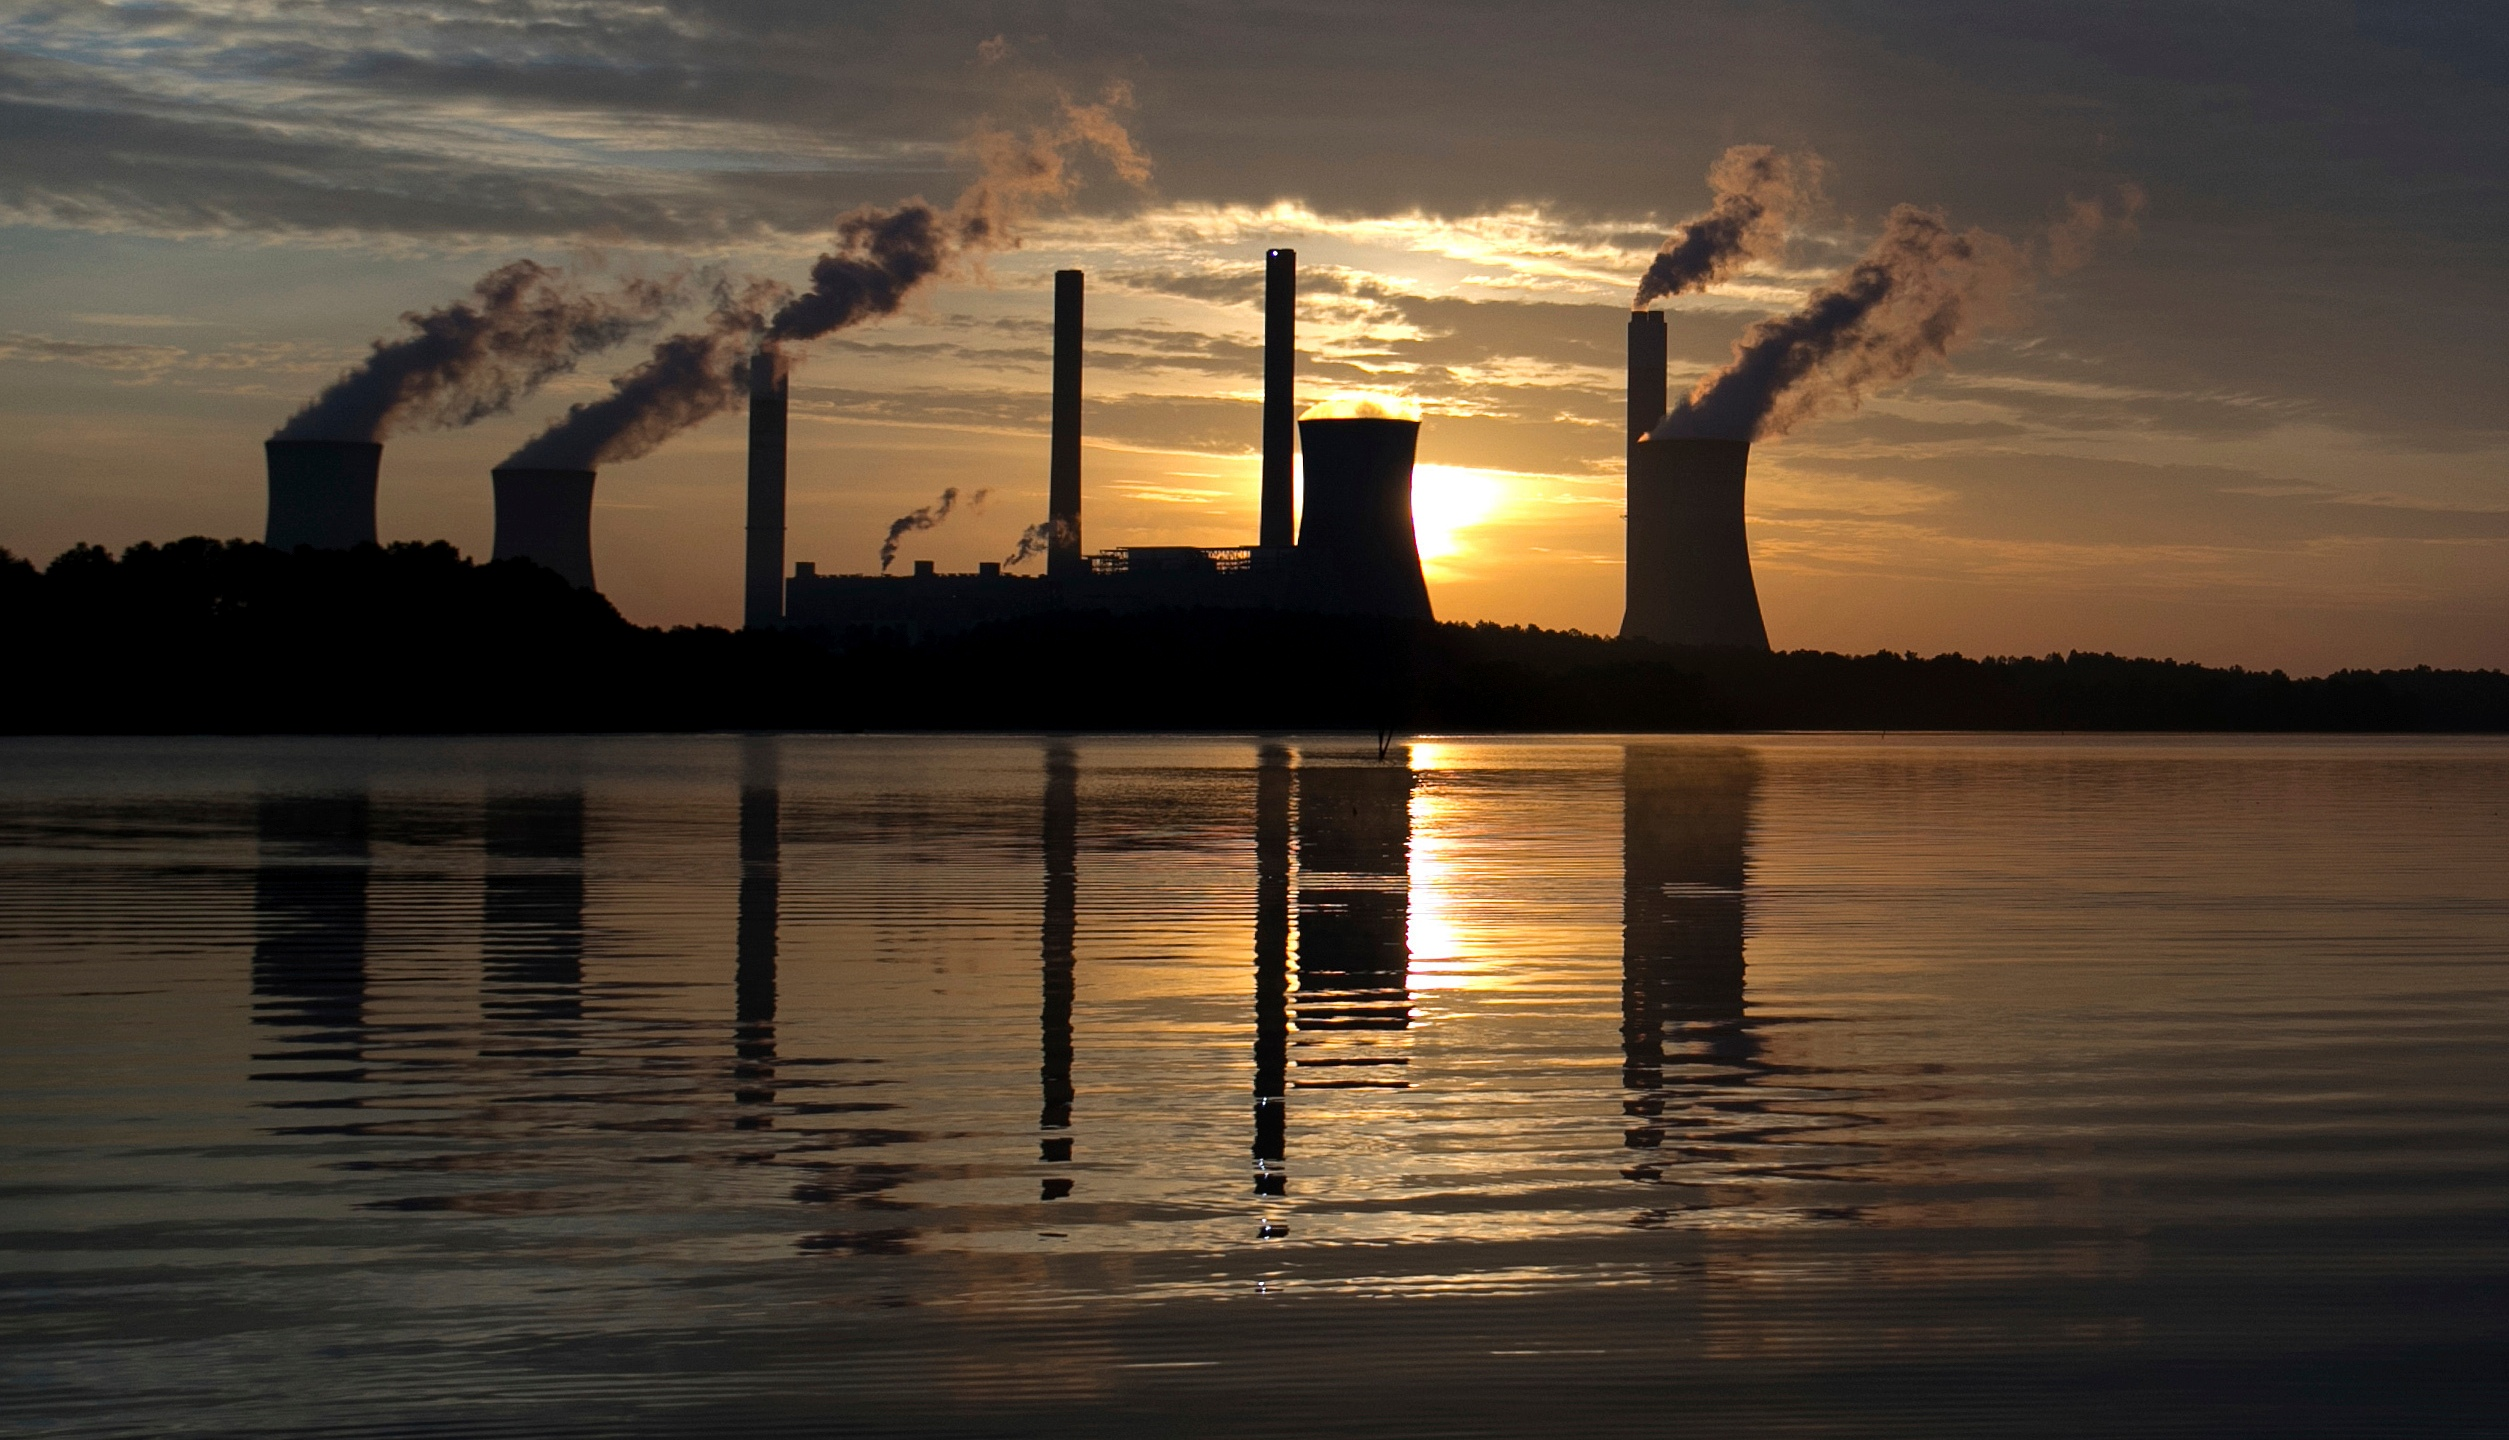 Climate_Change_Education_52872-159532.jpg56698680